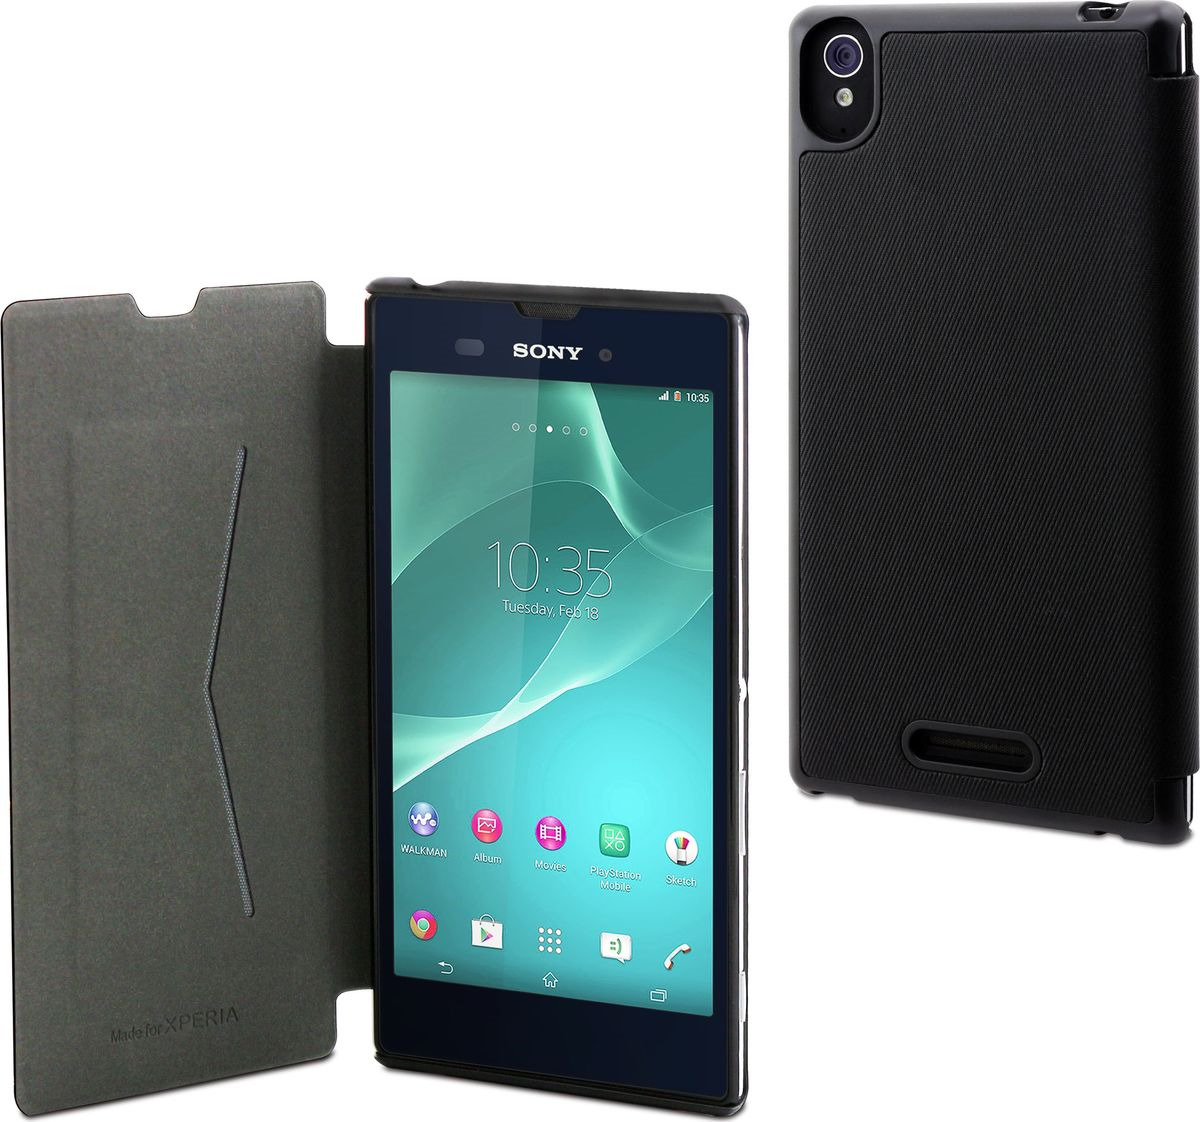 Чехол для сотового телефона Muvit MFX Ultra Slim Folio Case для Sony Xperia T3, SESLI0121, черный чехол книжка gresso канцлер для sony xperia xa ultra черный